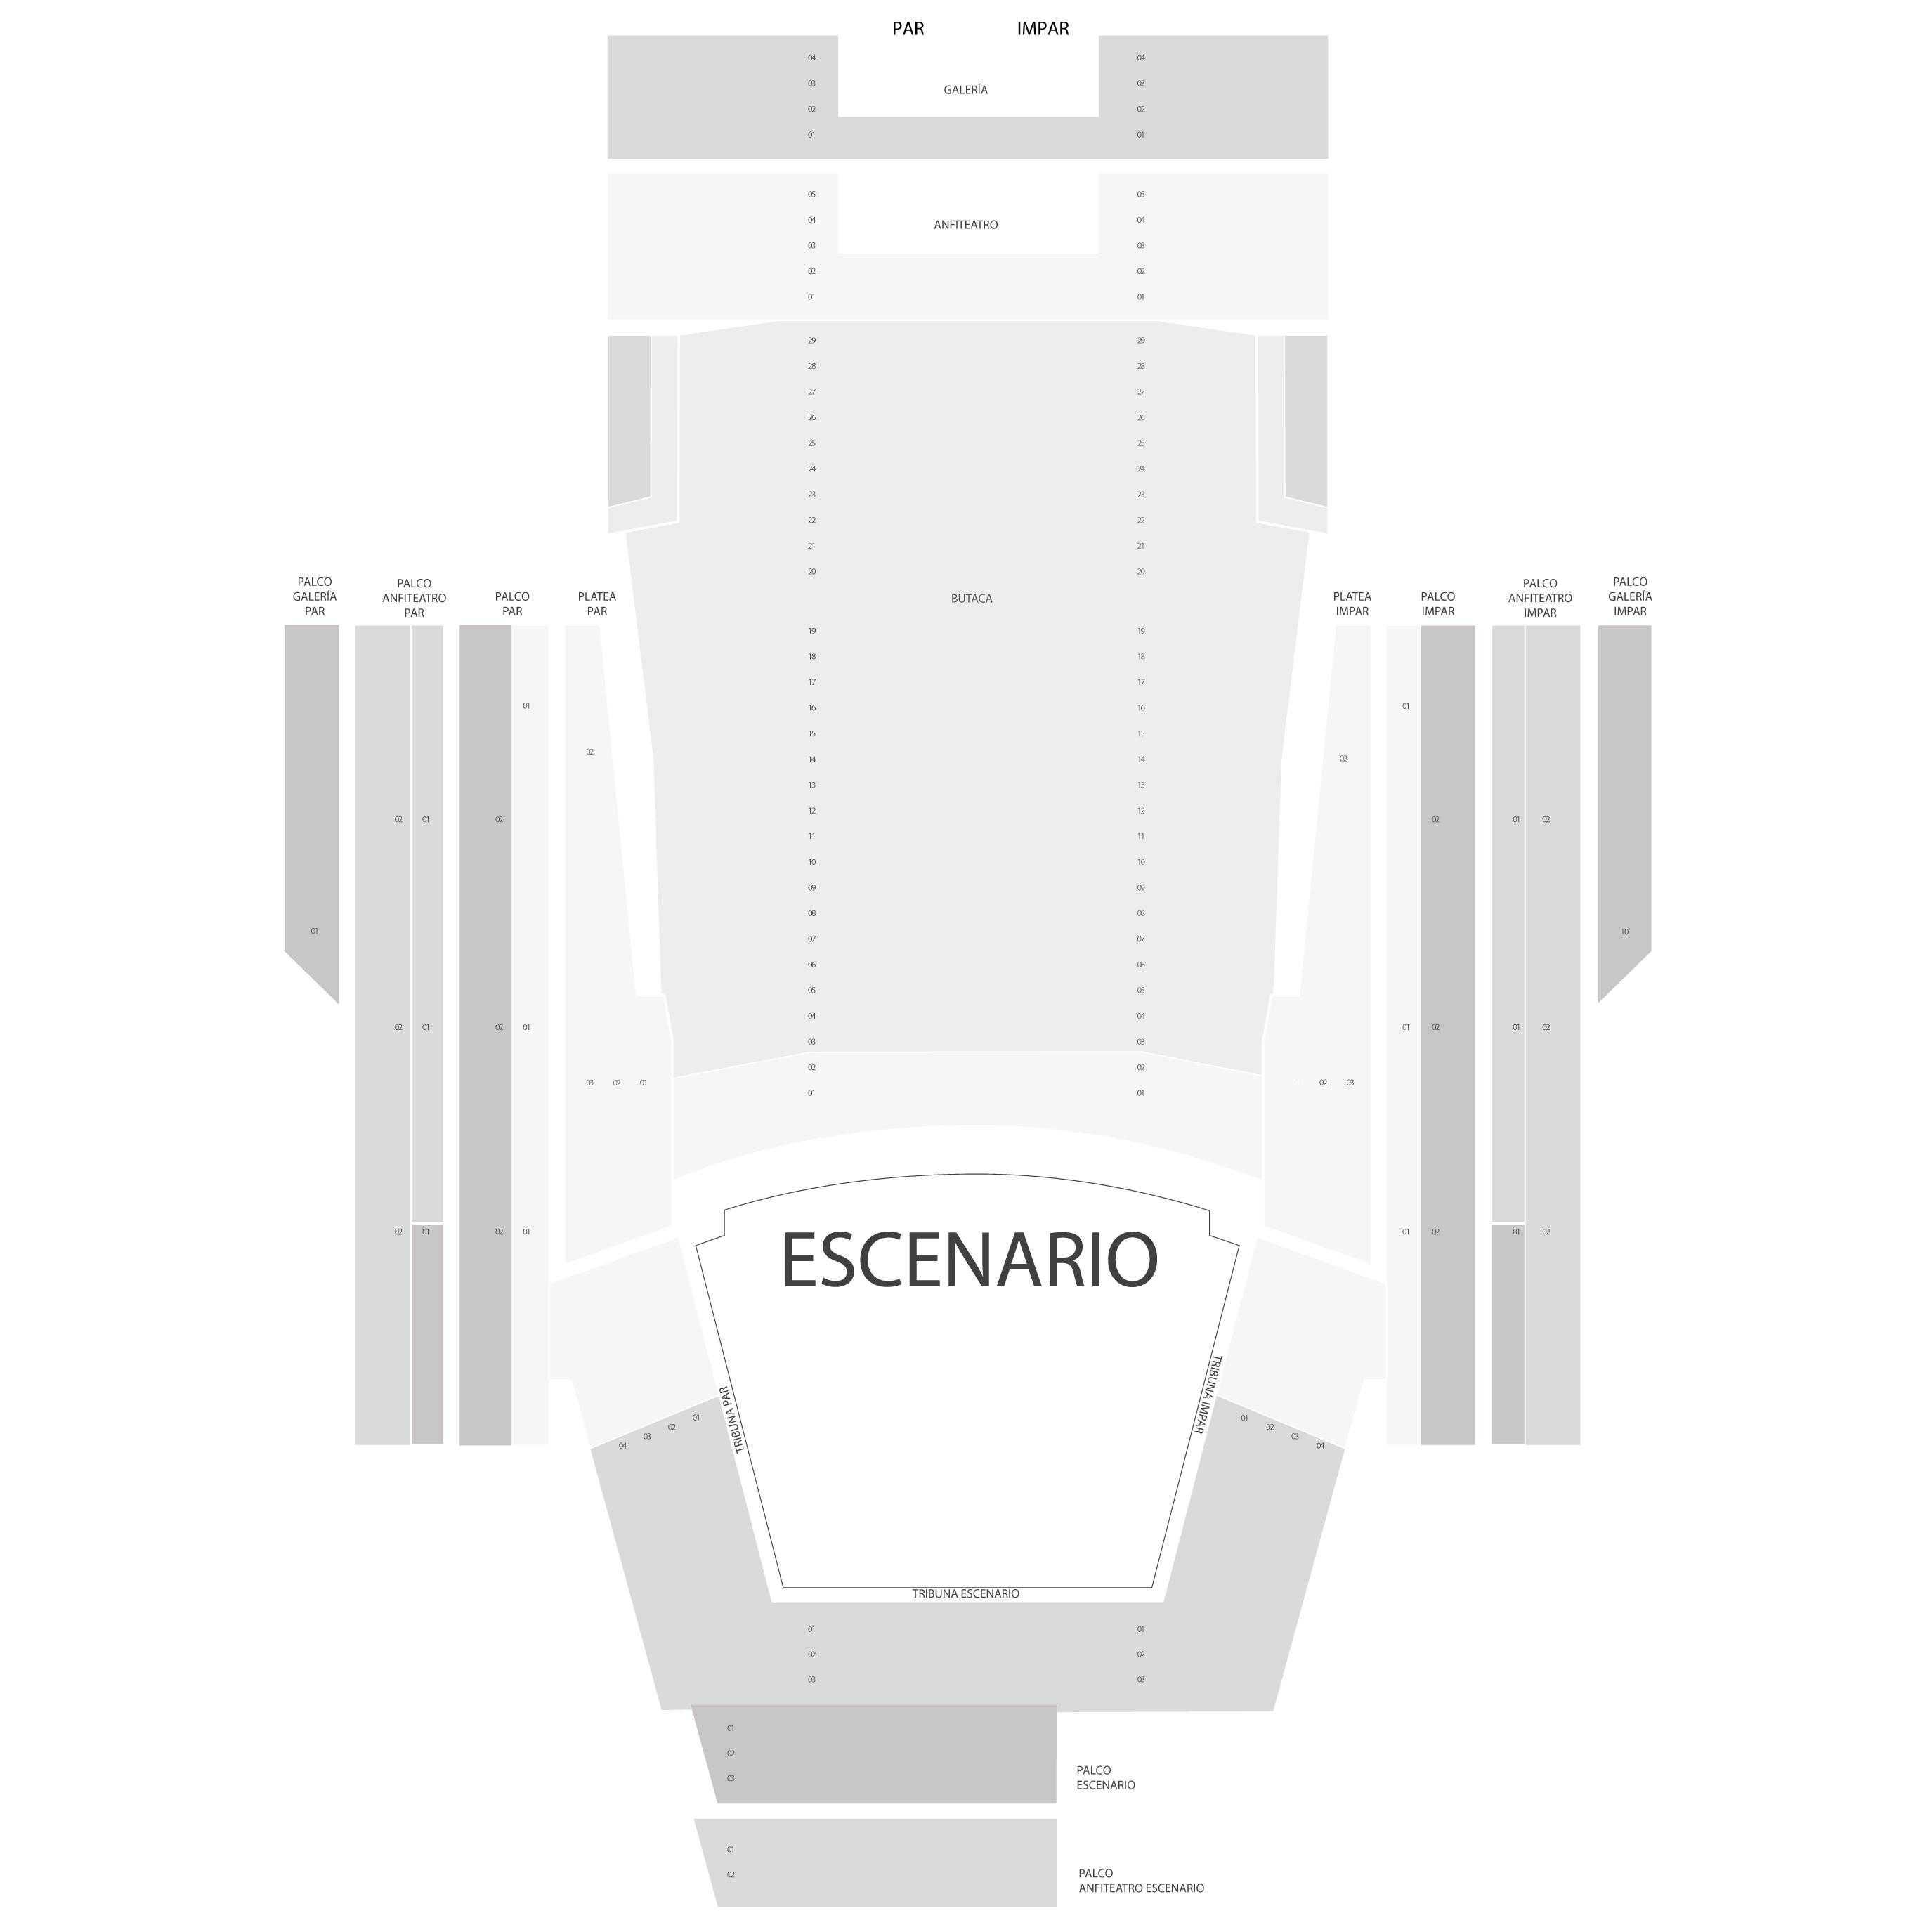 plano teatro